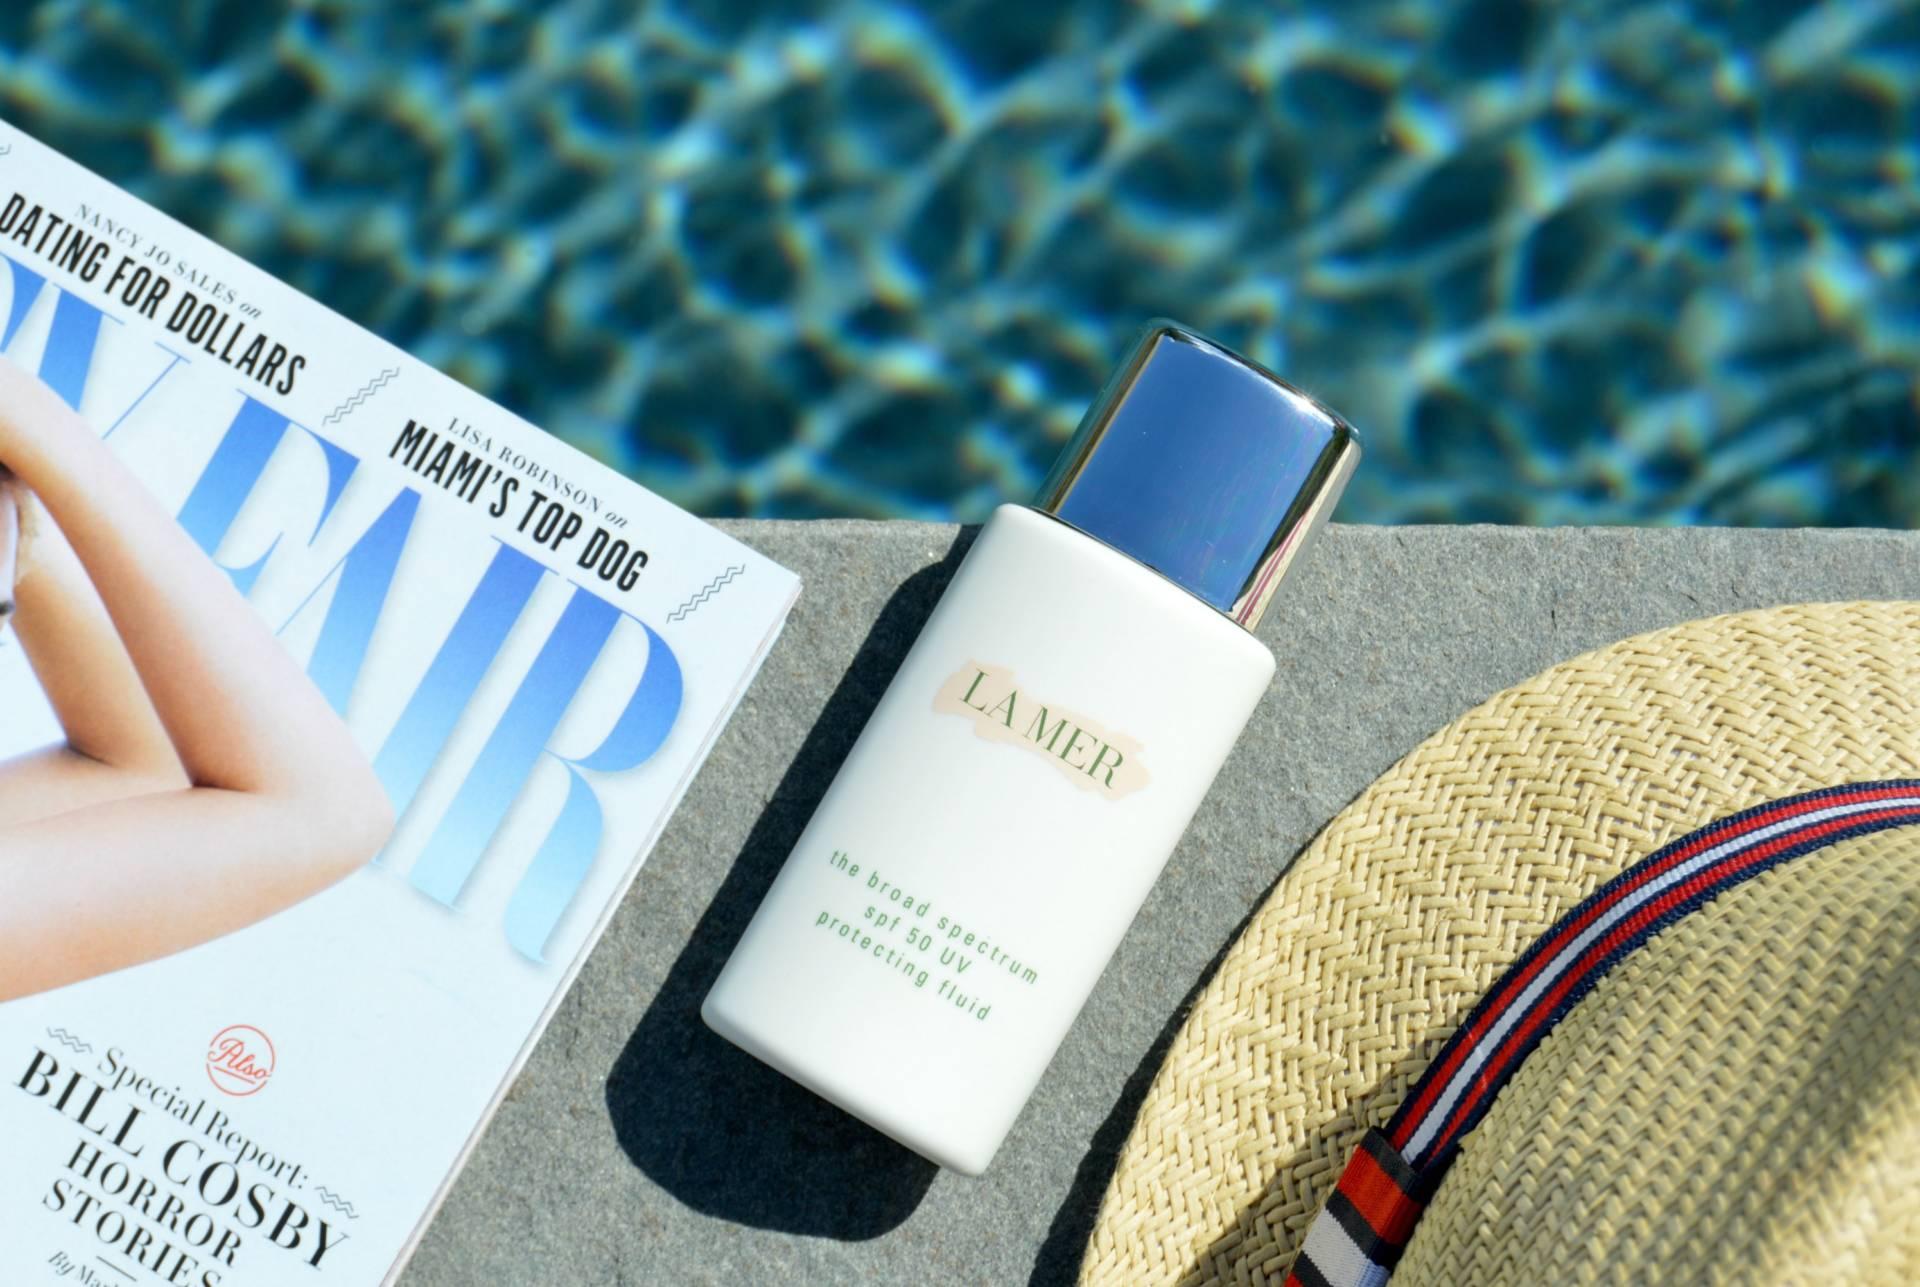 la mer uv spf 50 fluid inhautepursuit edit best of face sunscreens